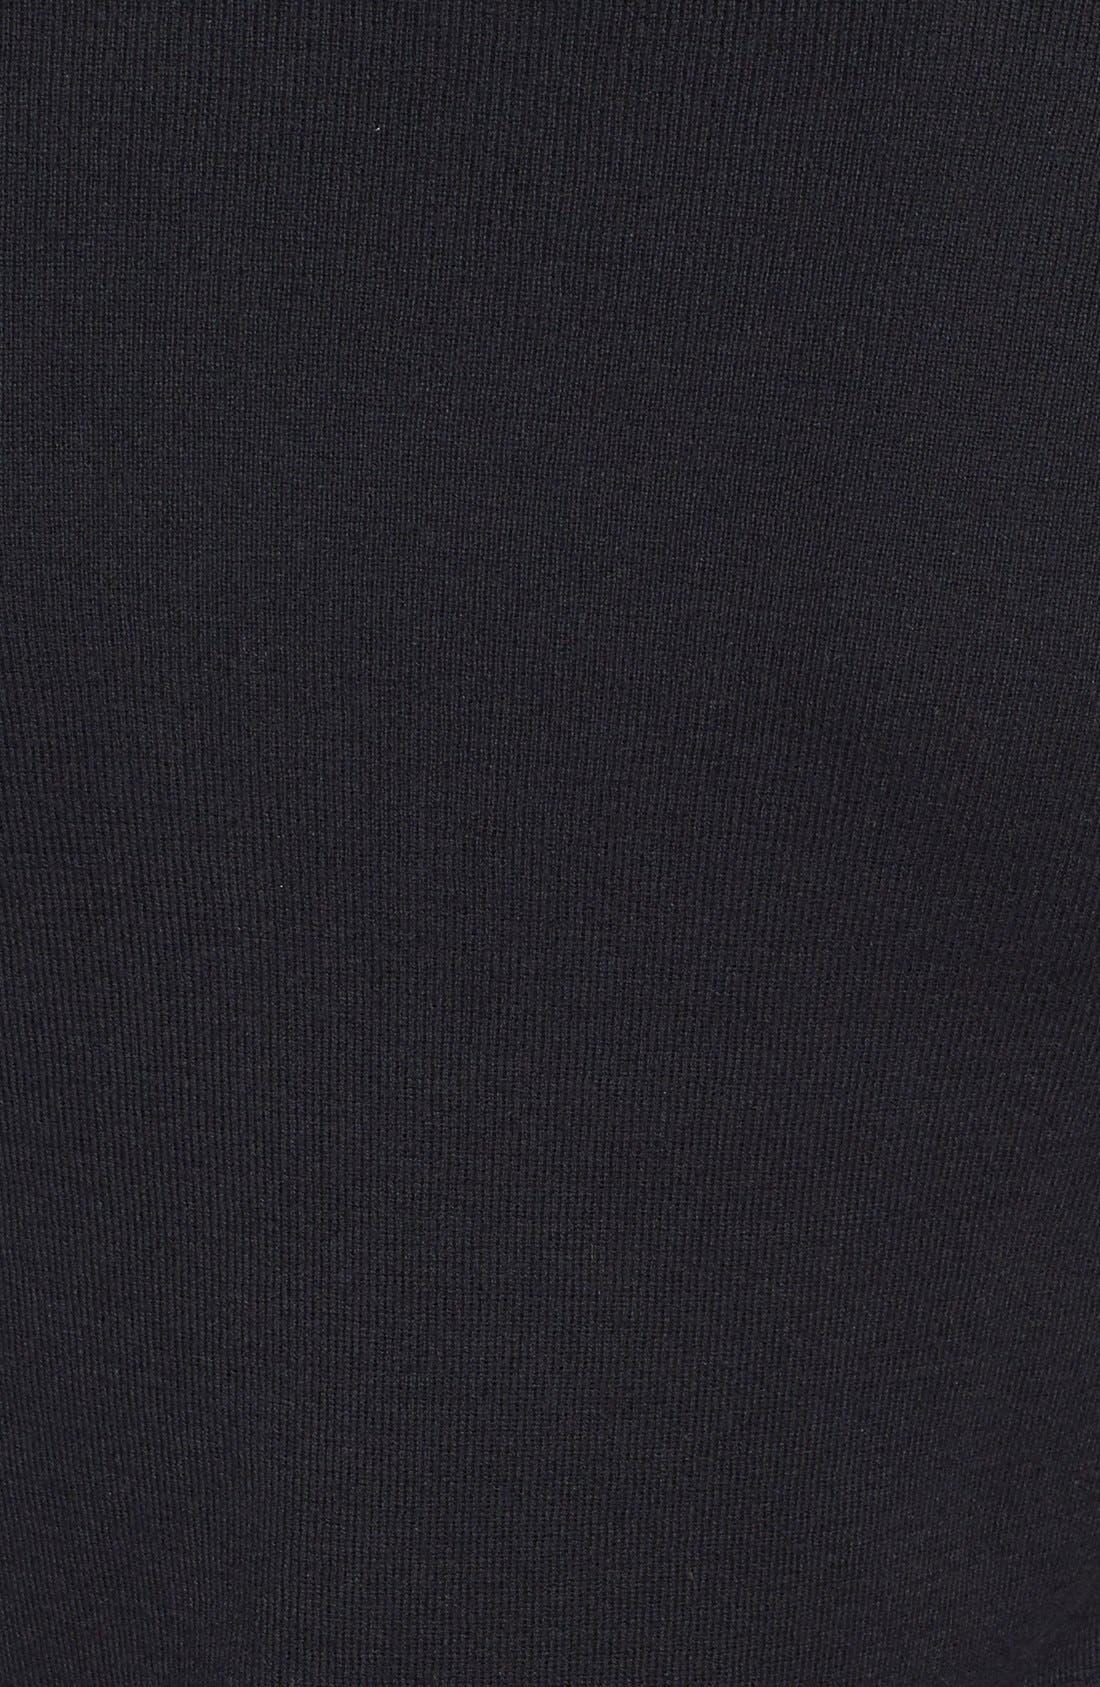 Four-Way Convertible Cardigan,                             Alternate thumbnail 3, color,                             BLACK ONYX